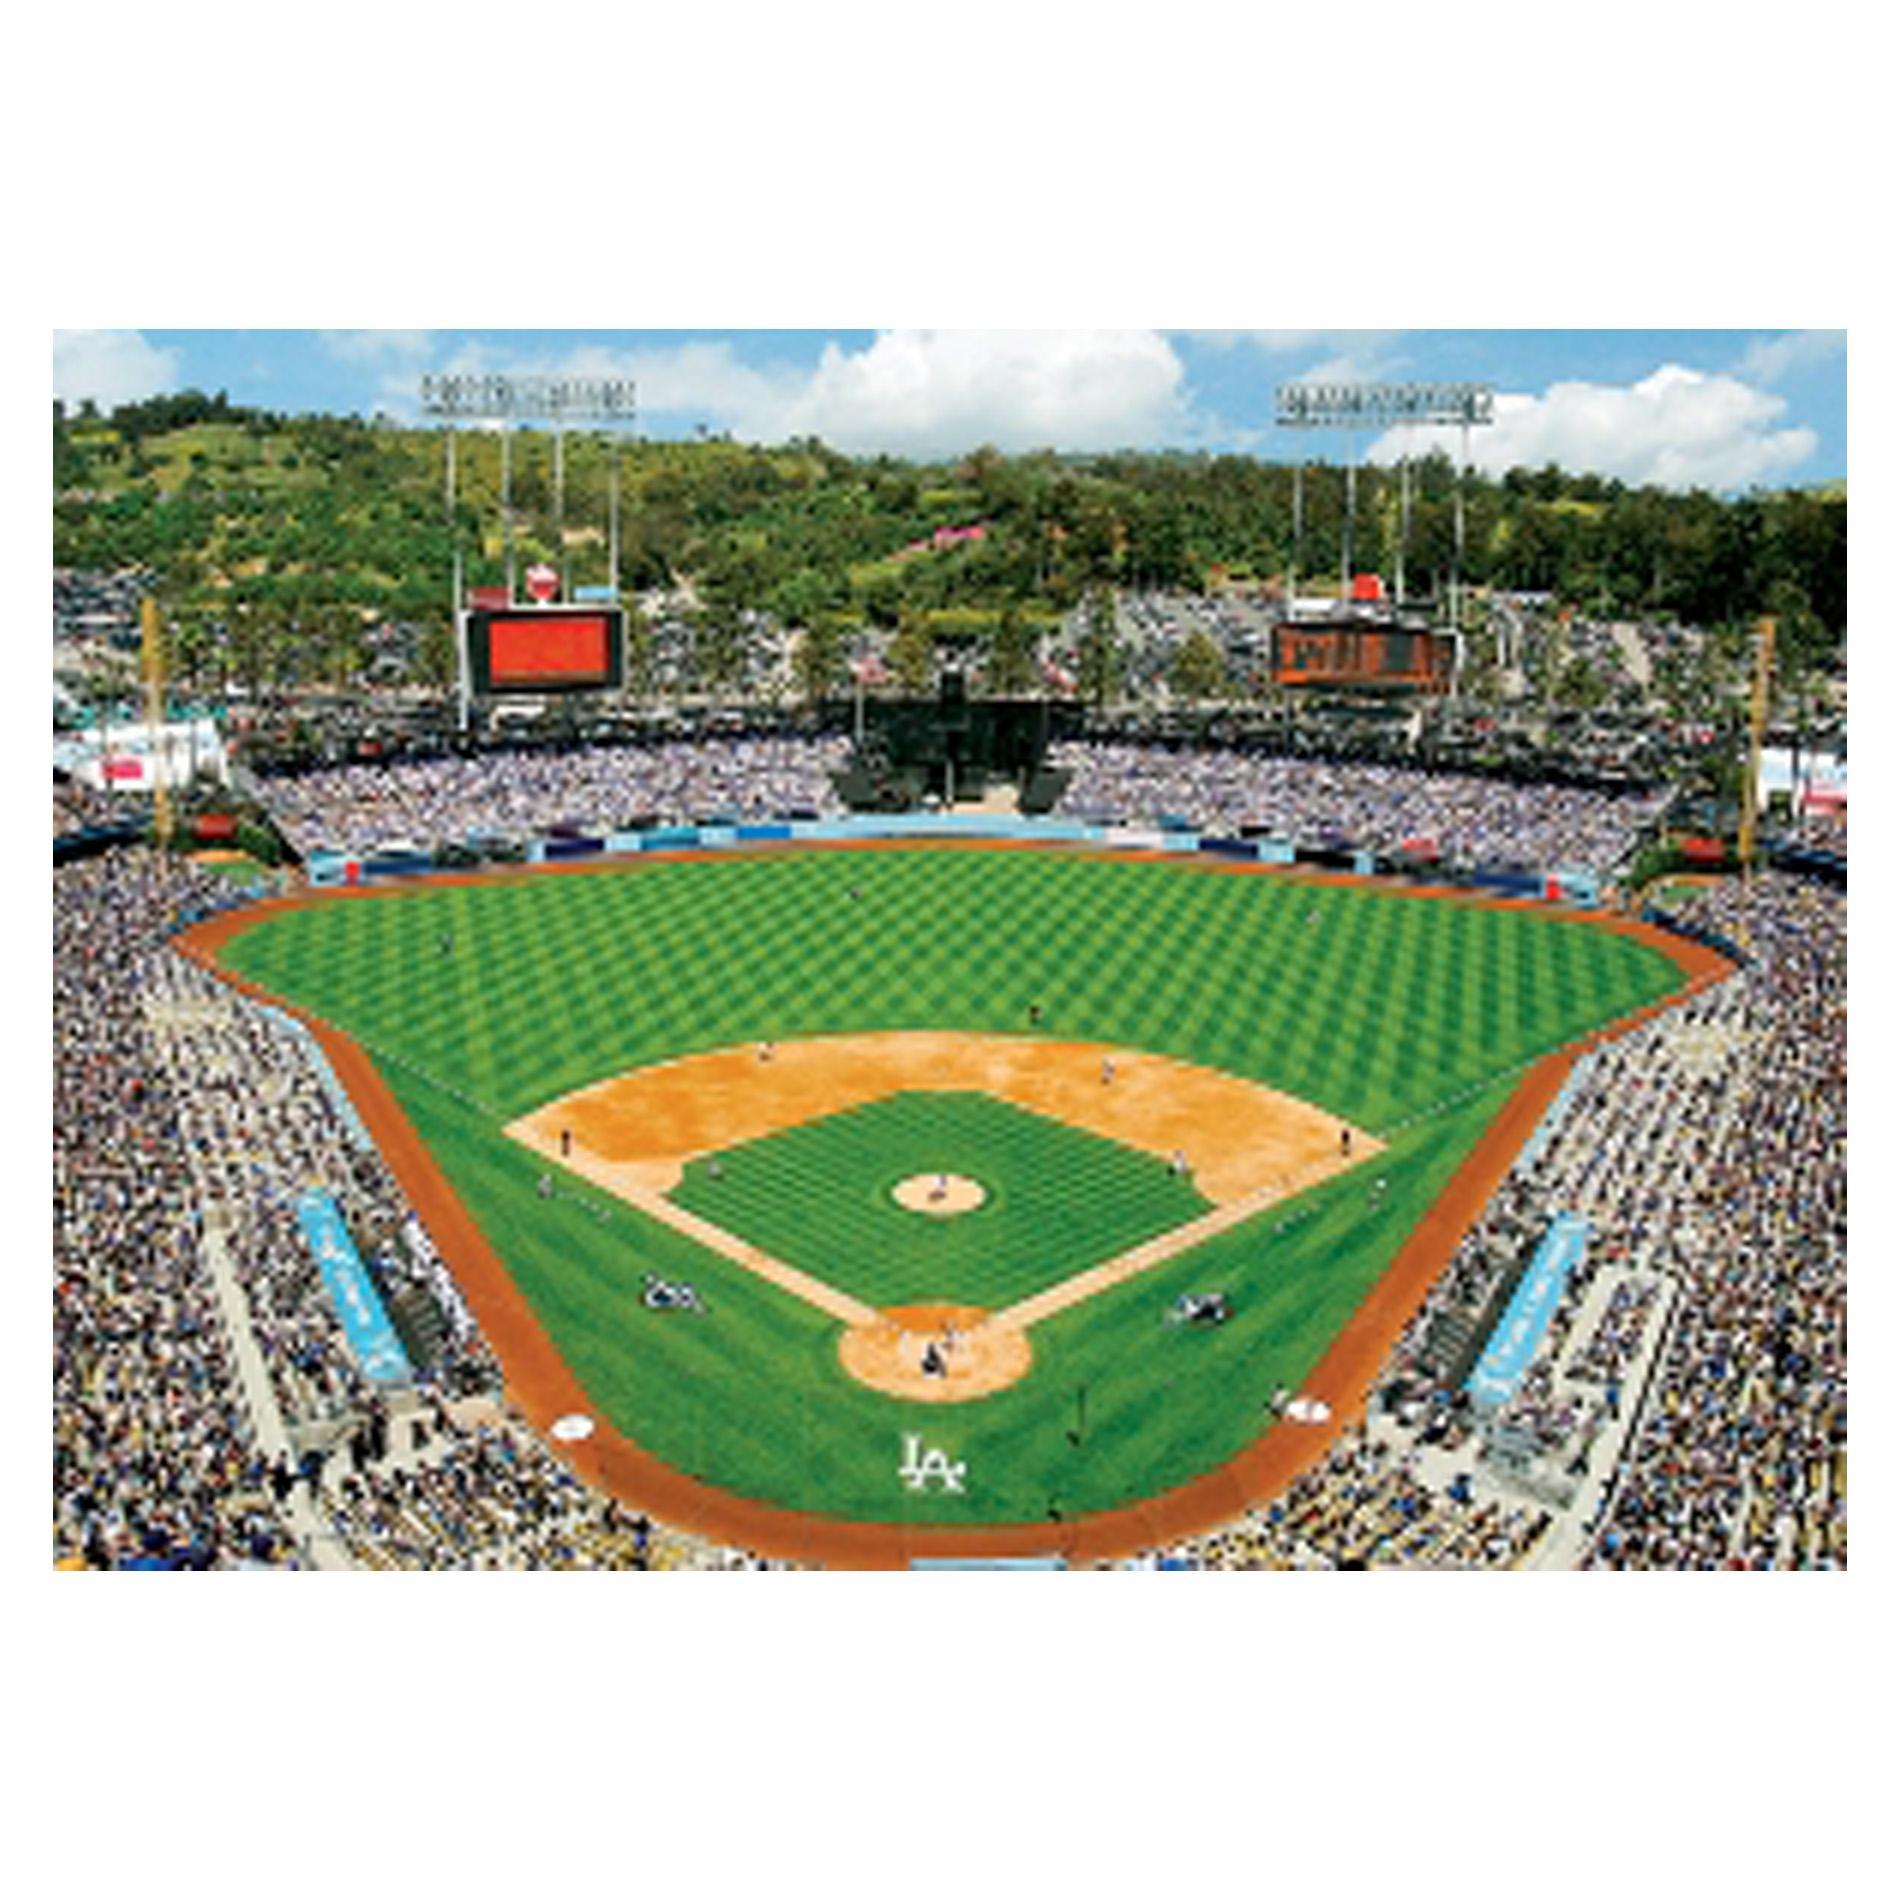 Los Angeles Dodgers MLB 500-piece Puzzle